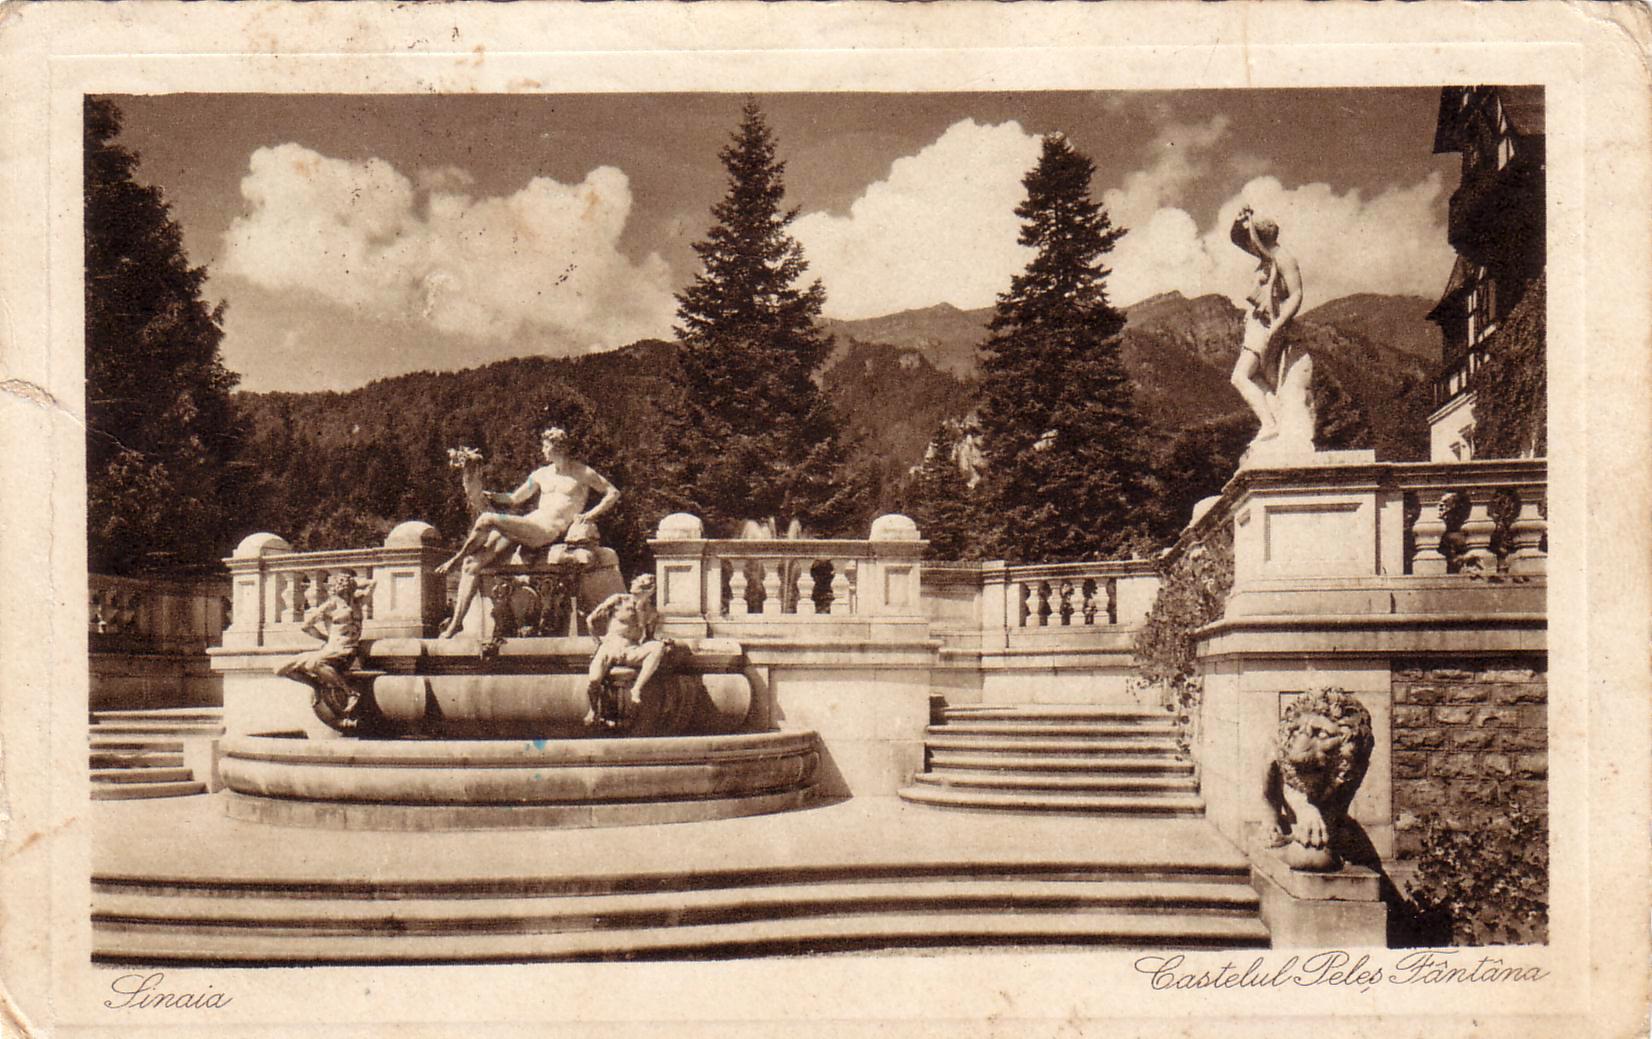 castelul peles sinaia 1941